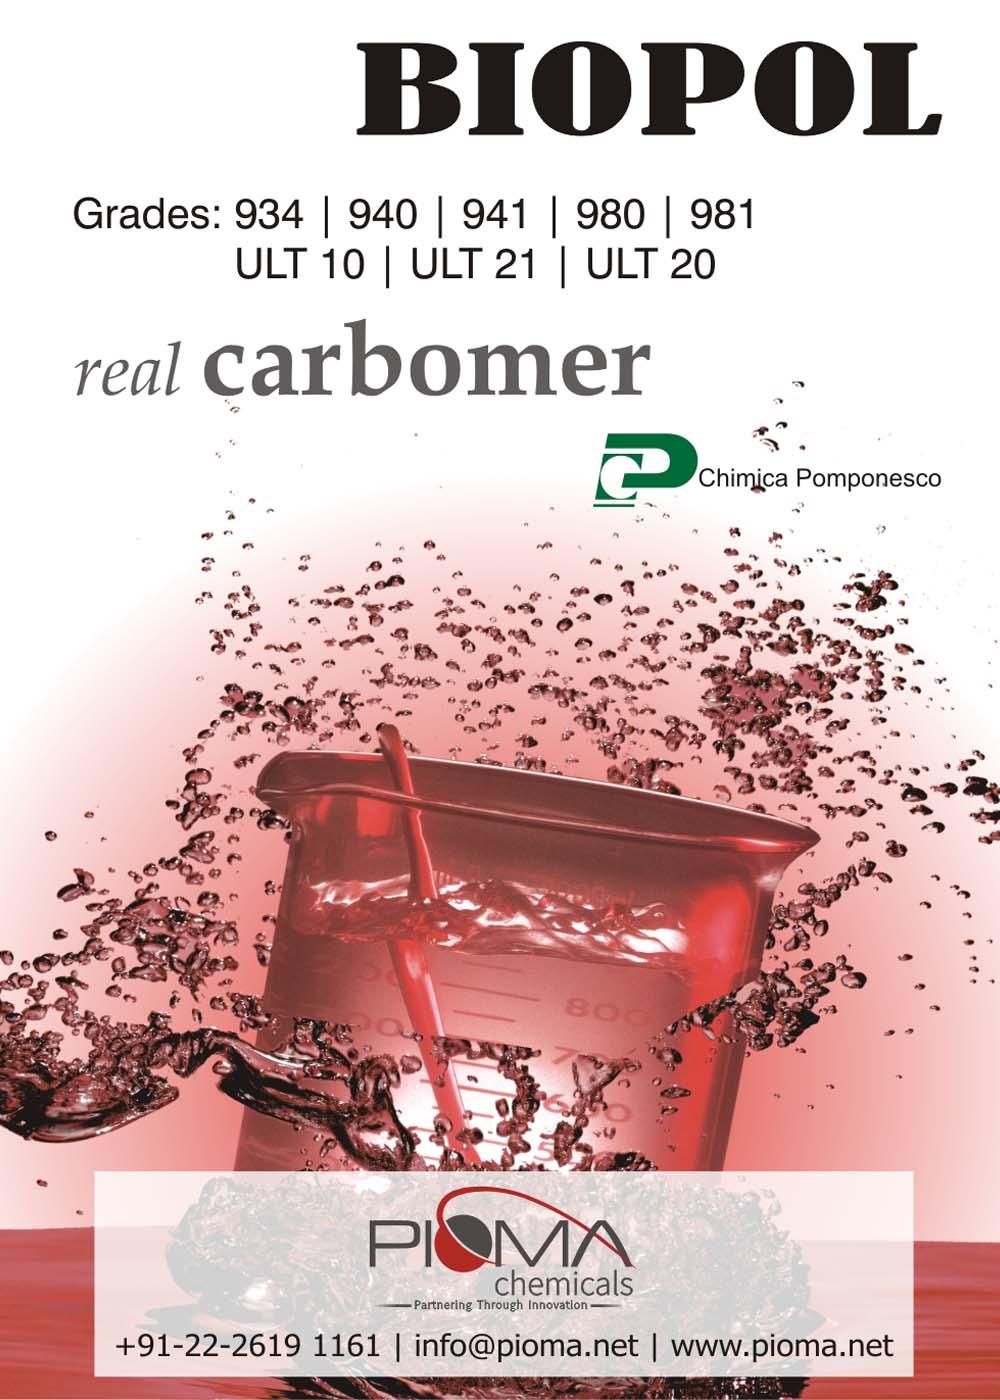 Pharmacoat hpmc – Pioma Chemicals – ChemFreeCom